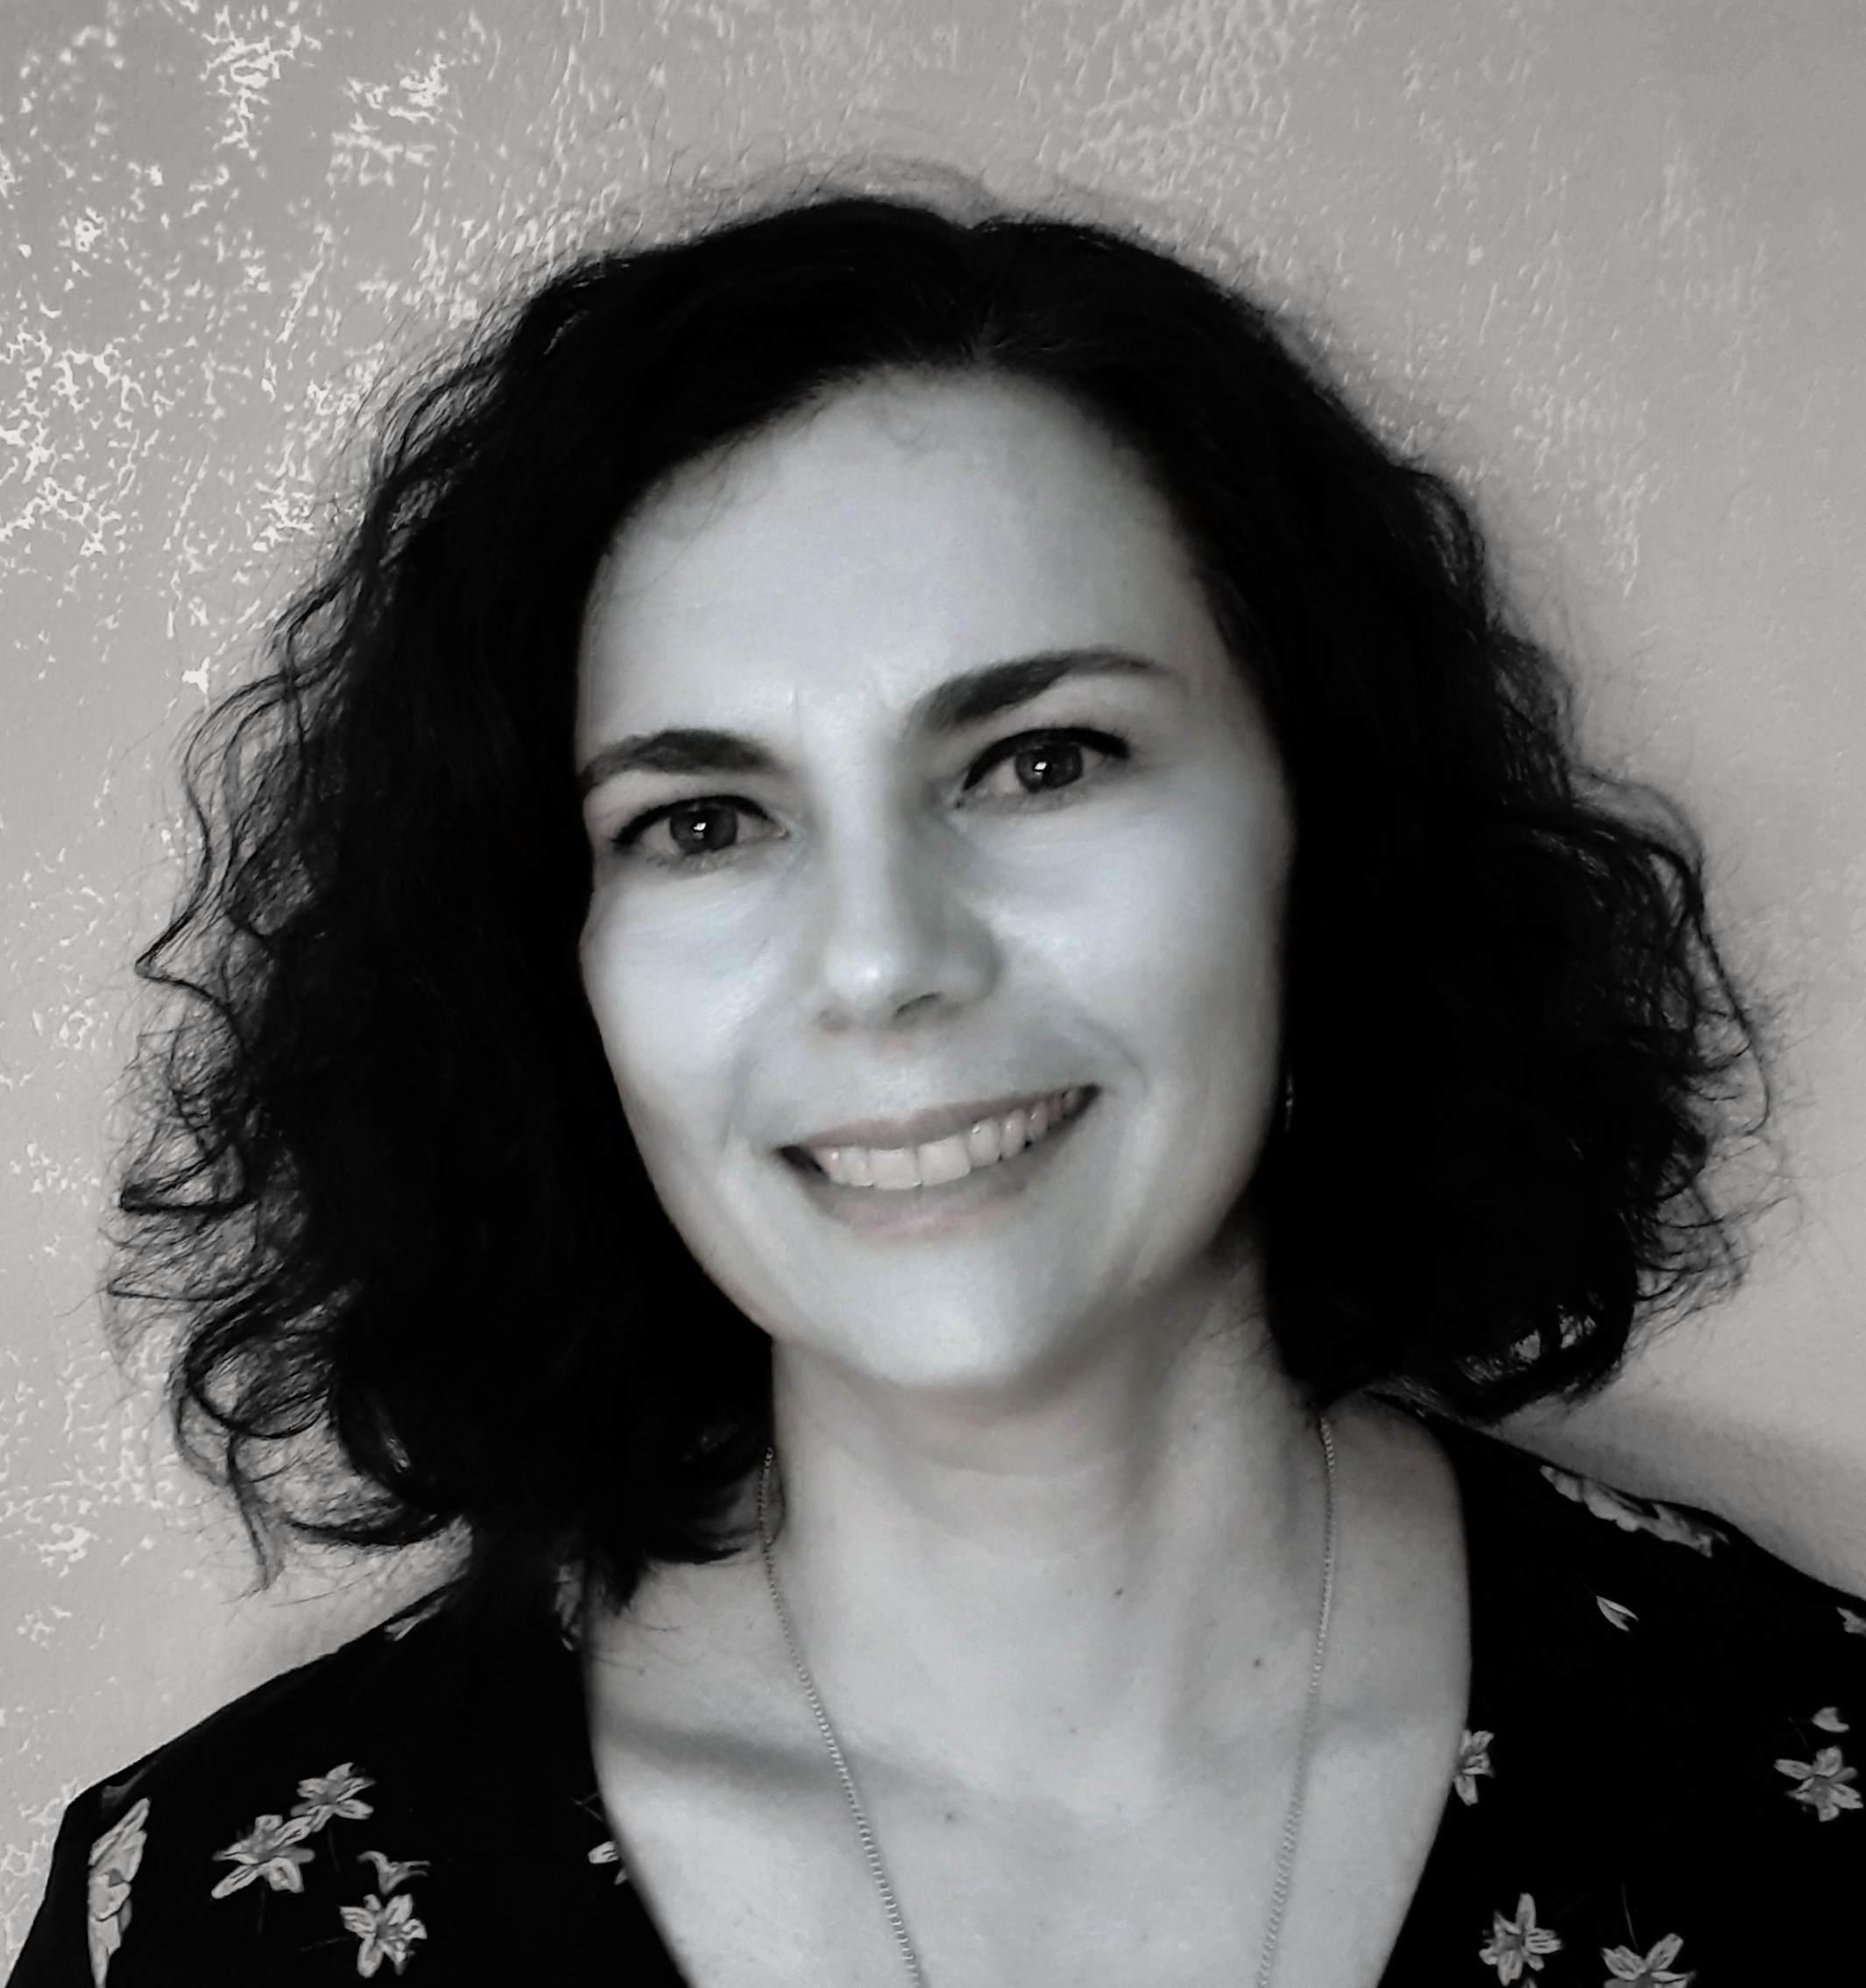 Muriel Varenne